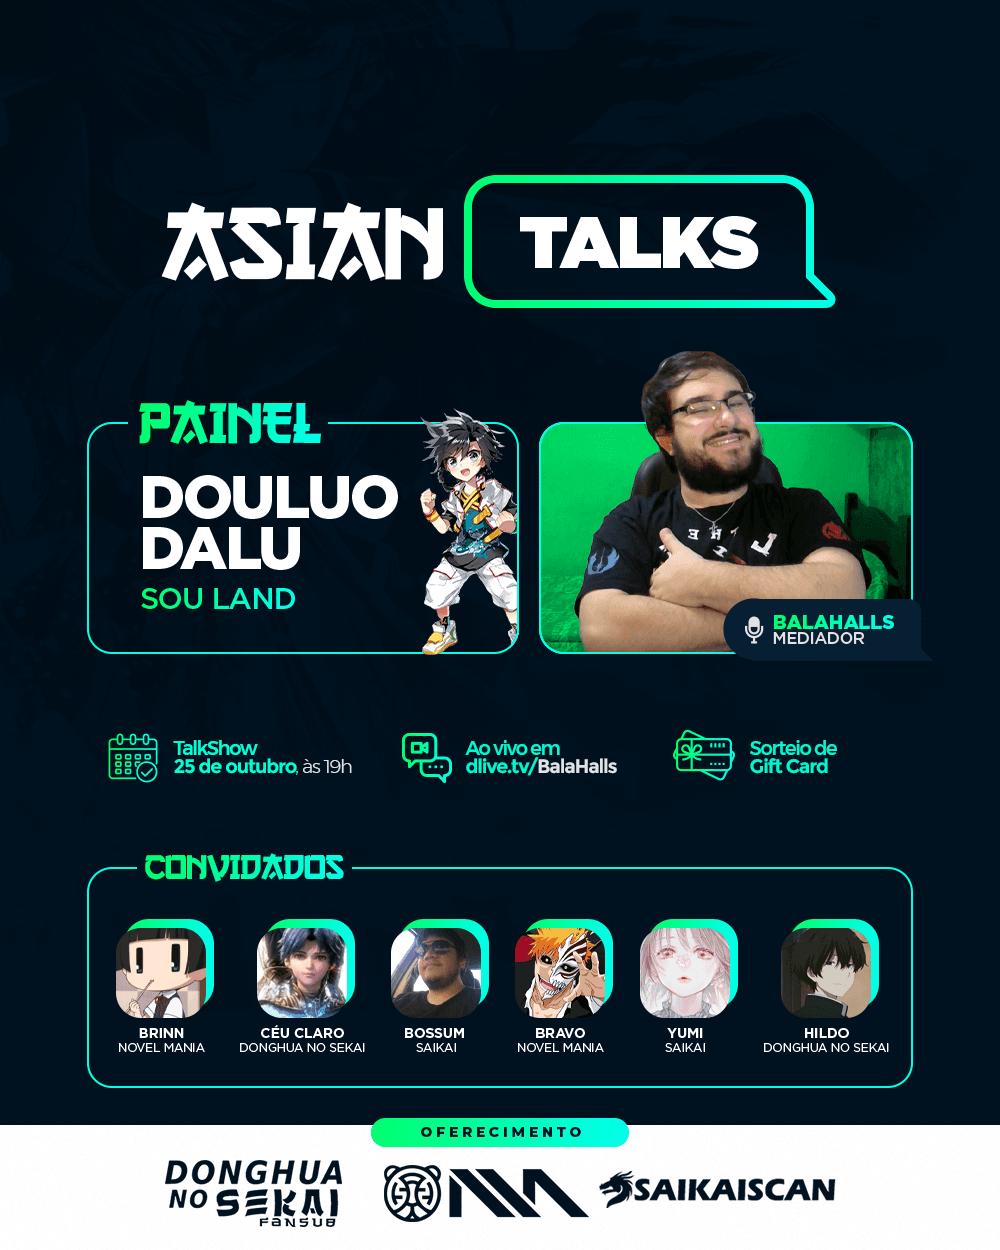 Asian Talks: Douluo Dalu